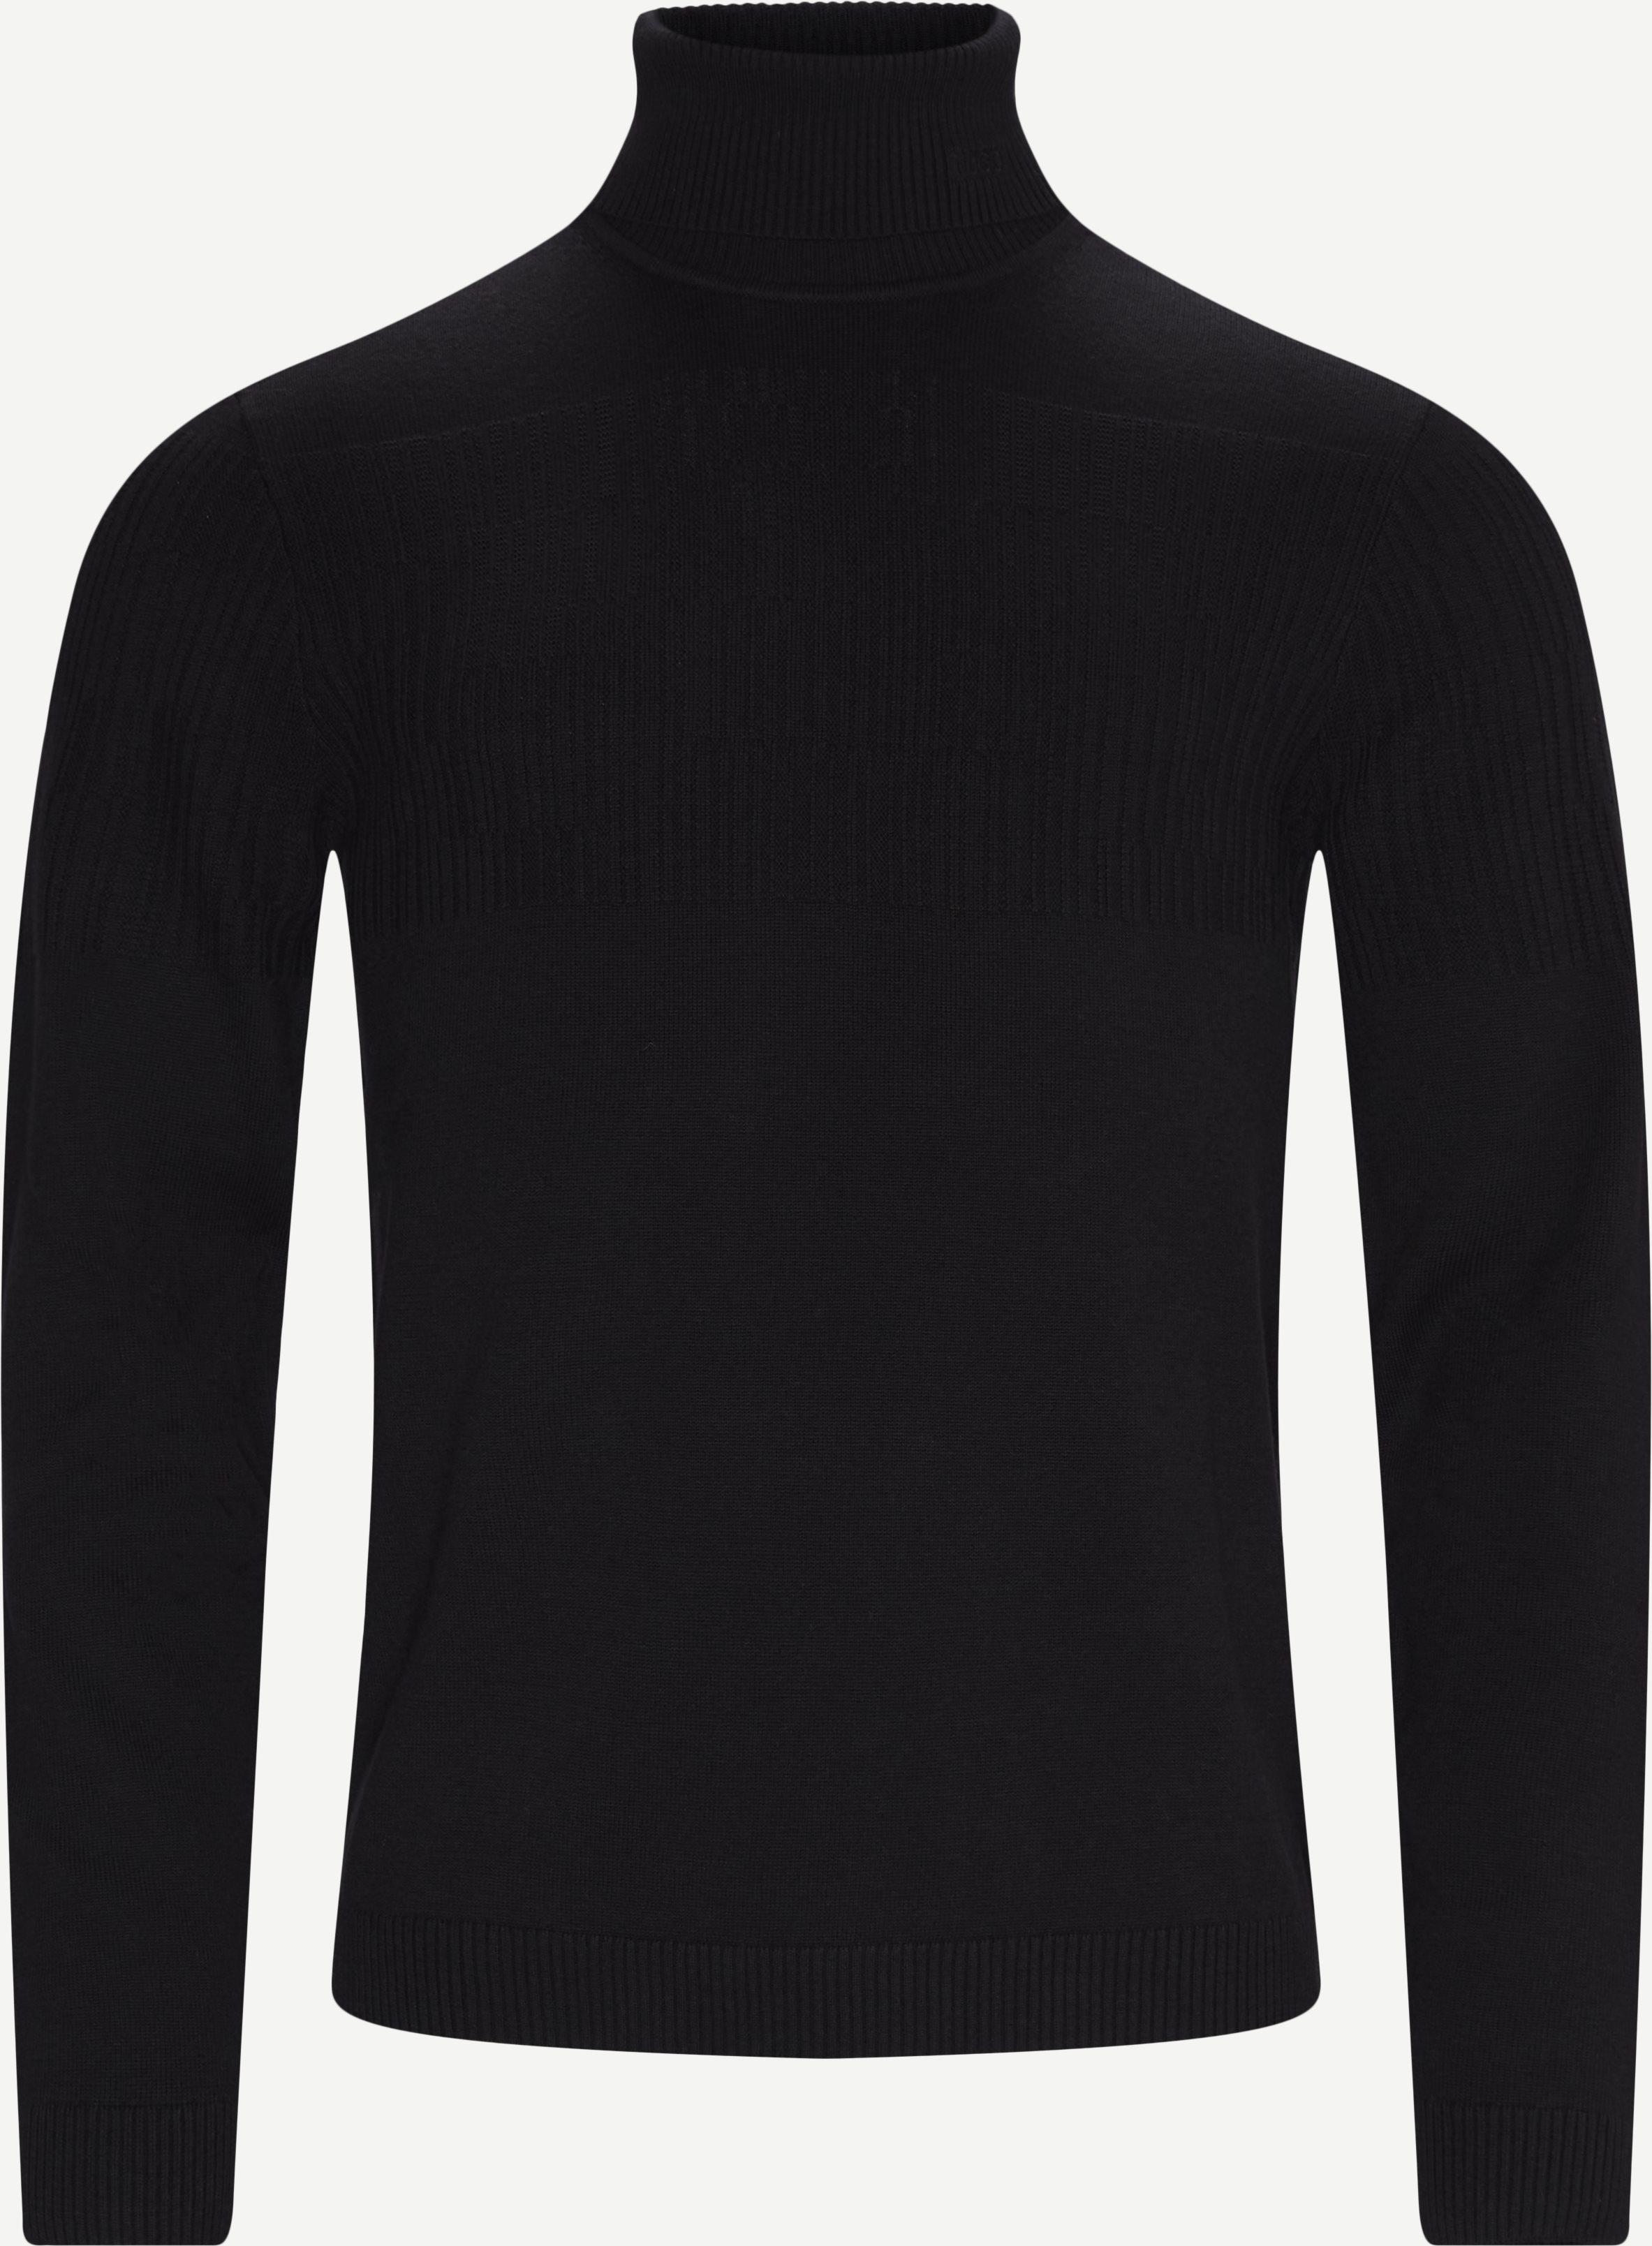 Siseon Rollneck Sweater - Stickat - Slim - Svart